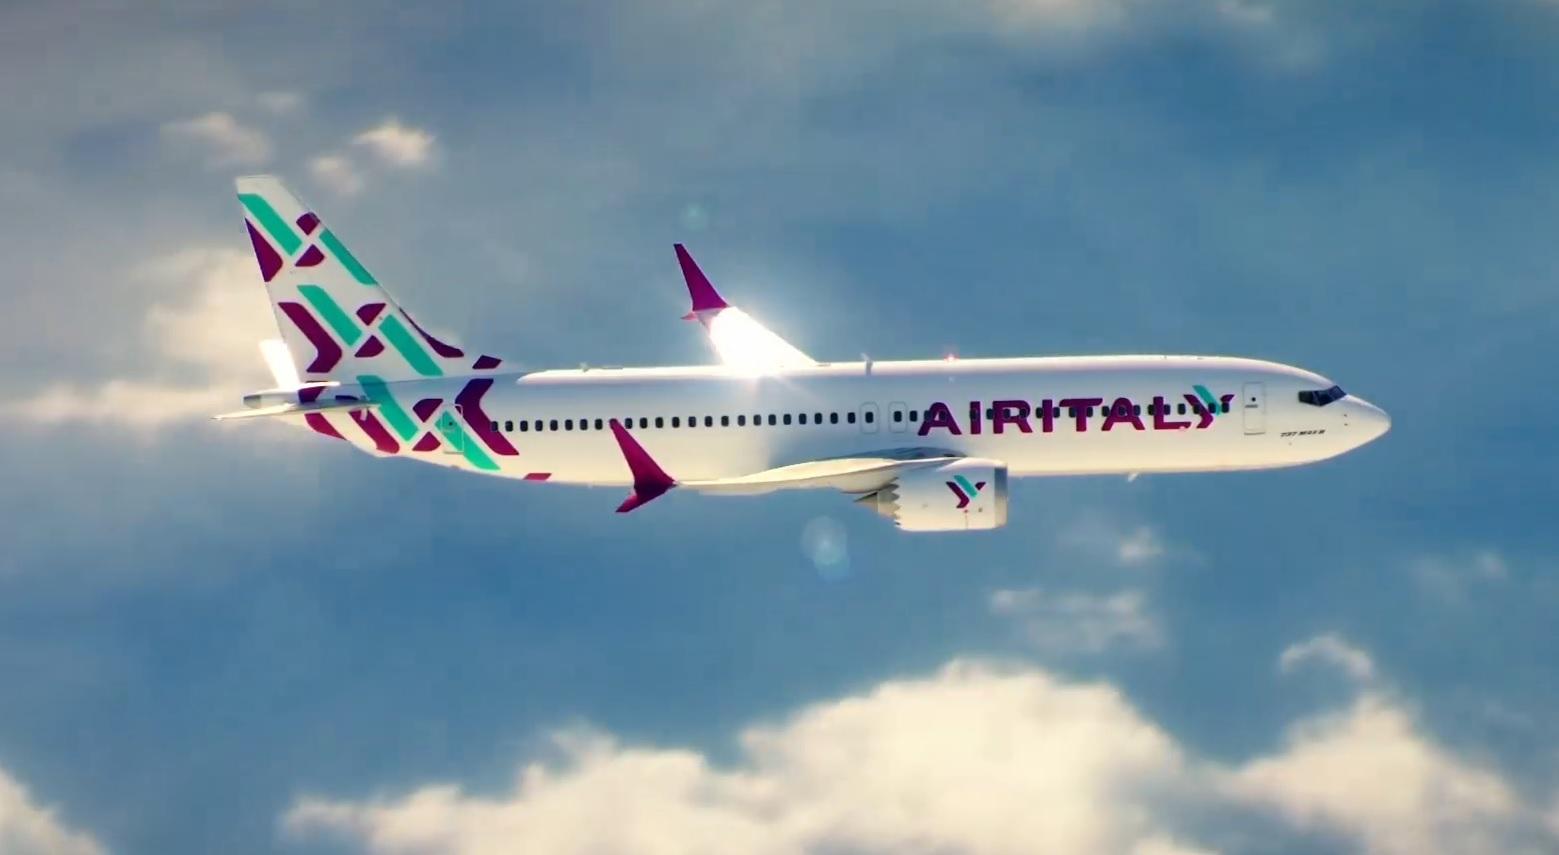 One of the biggest Italian airline companies declared its liquidation